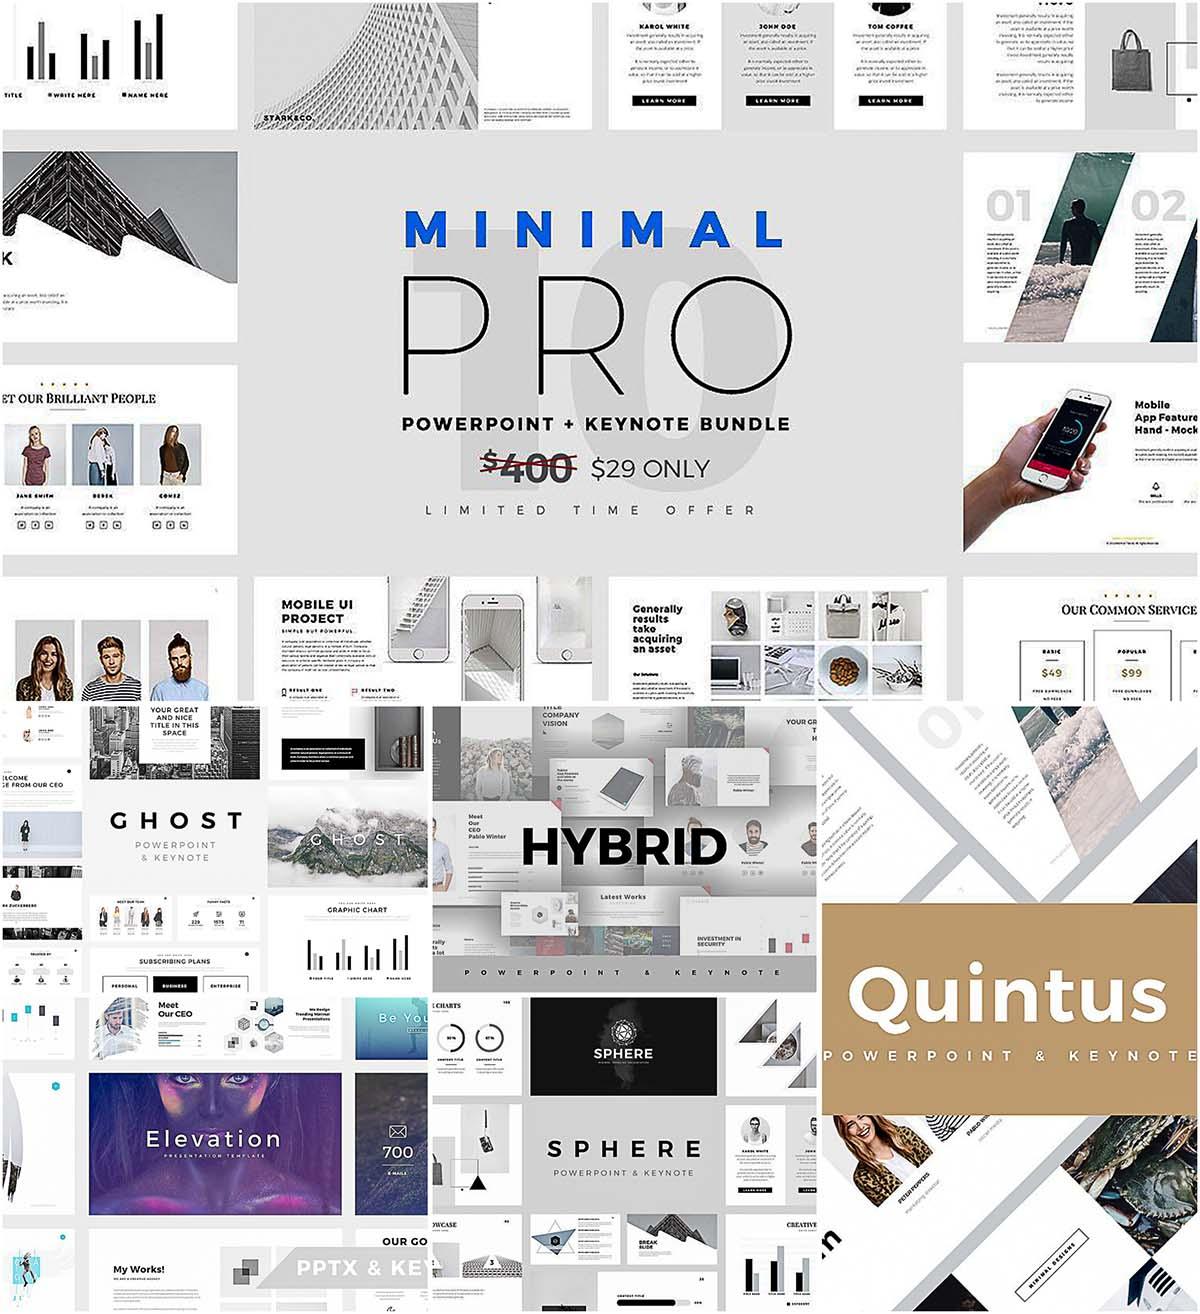 Minimal pro presentations keynote powerpoint